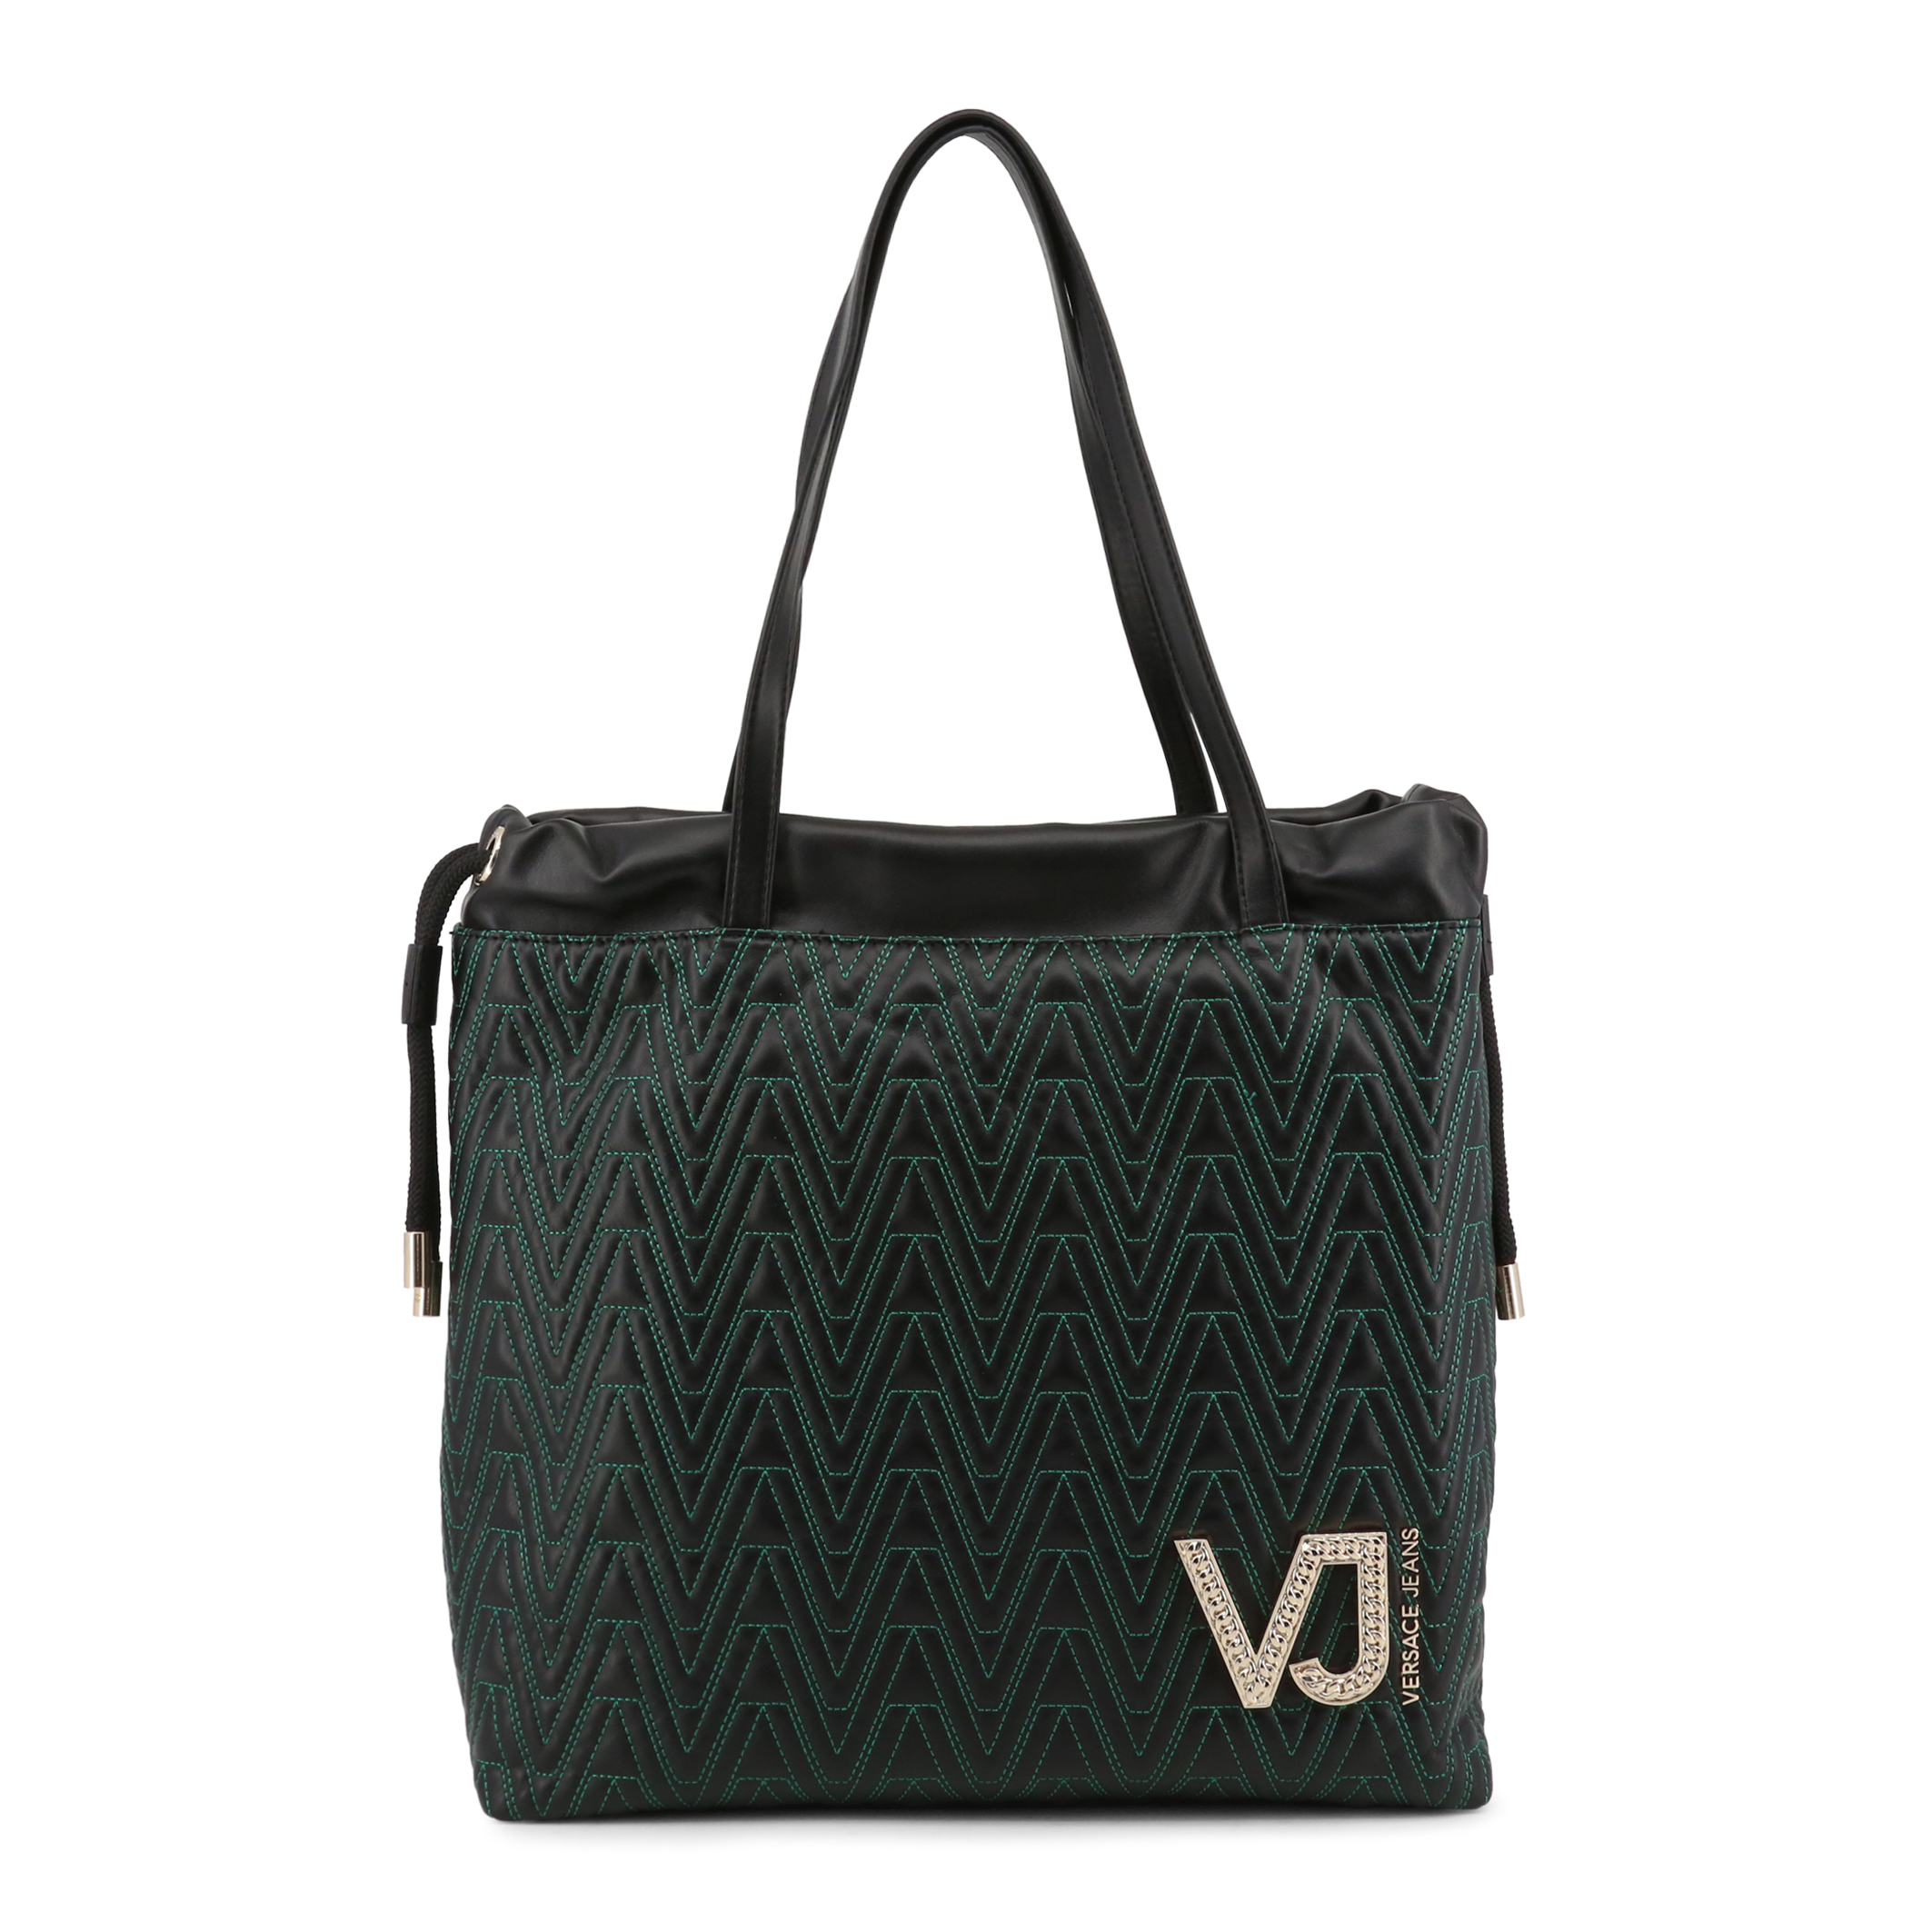 Versace Jeans E1VSBBI3 70784